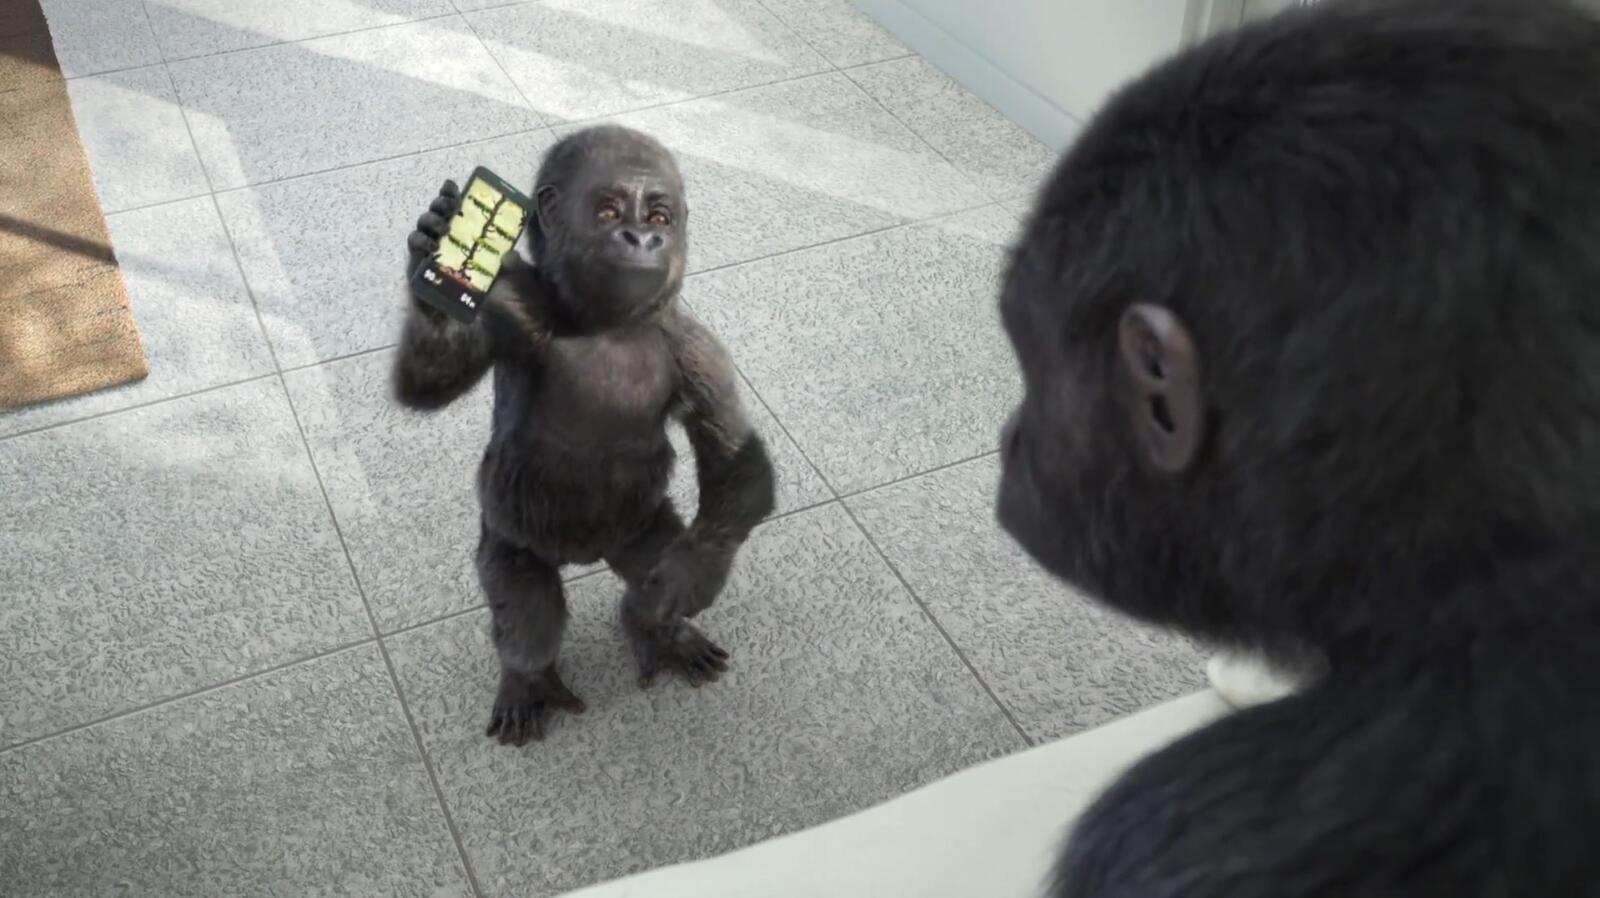 gorilla glass 4 soll displaybr che verhindern. Black Bedroom Furniture Sets. Home Design Ideas